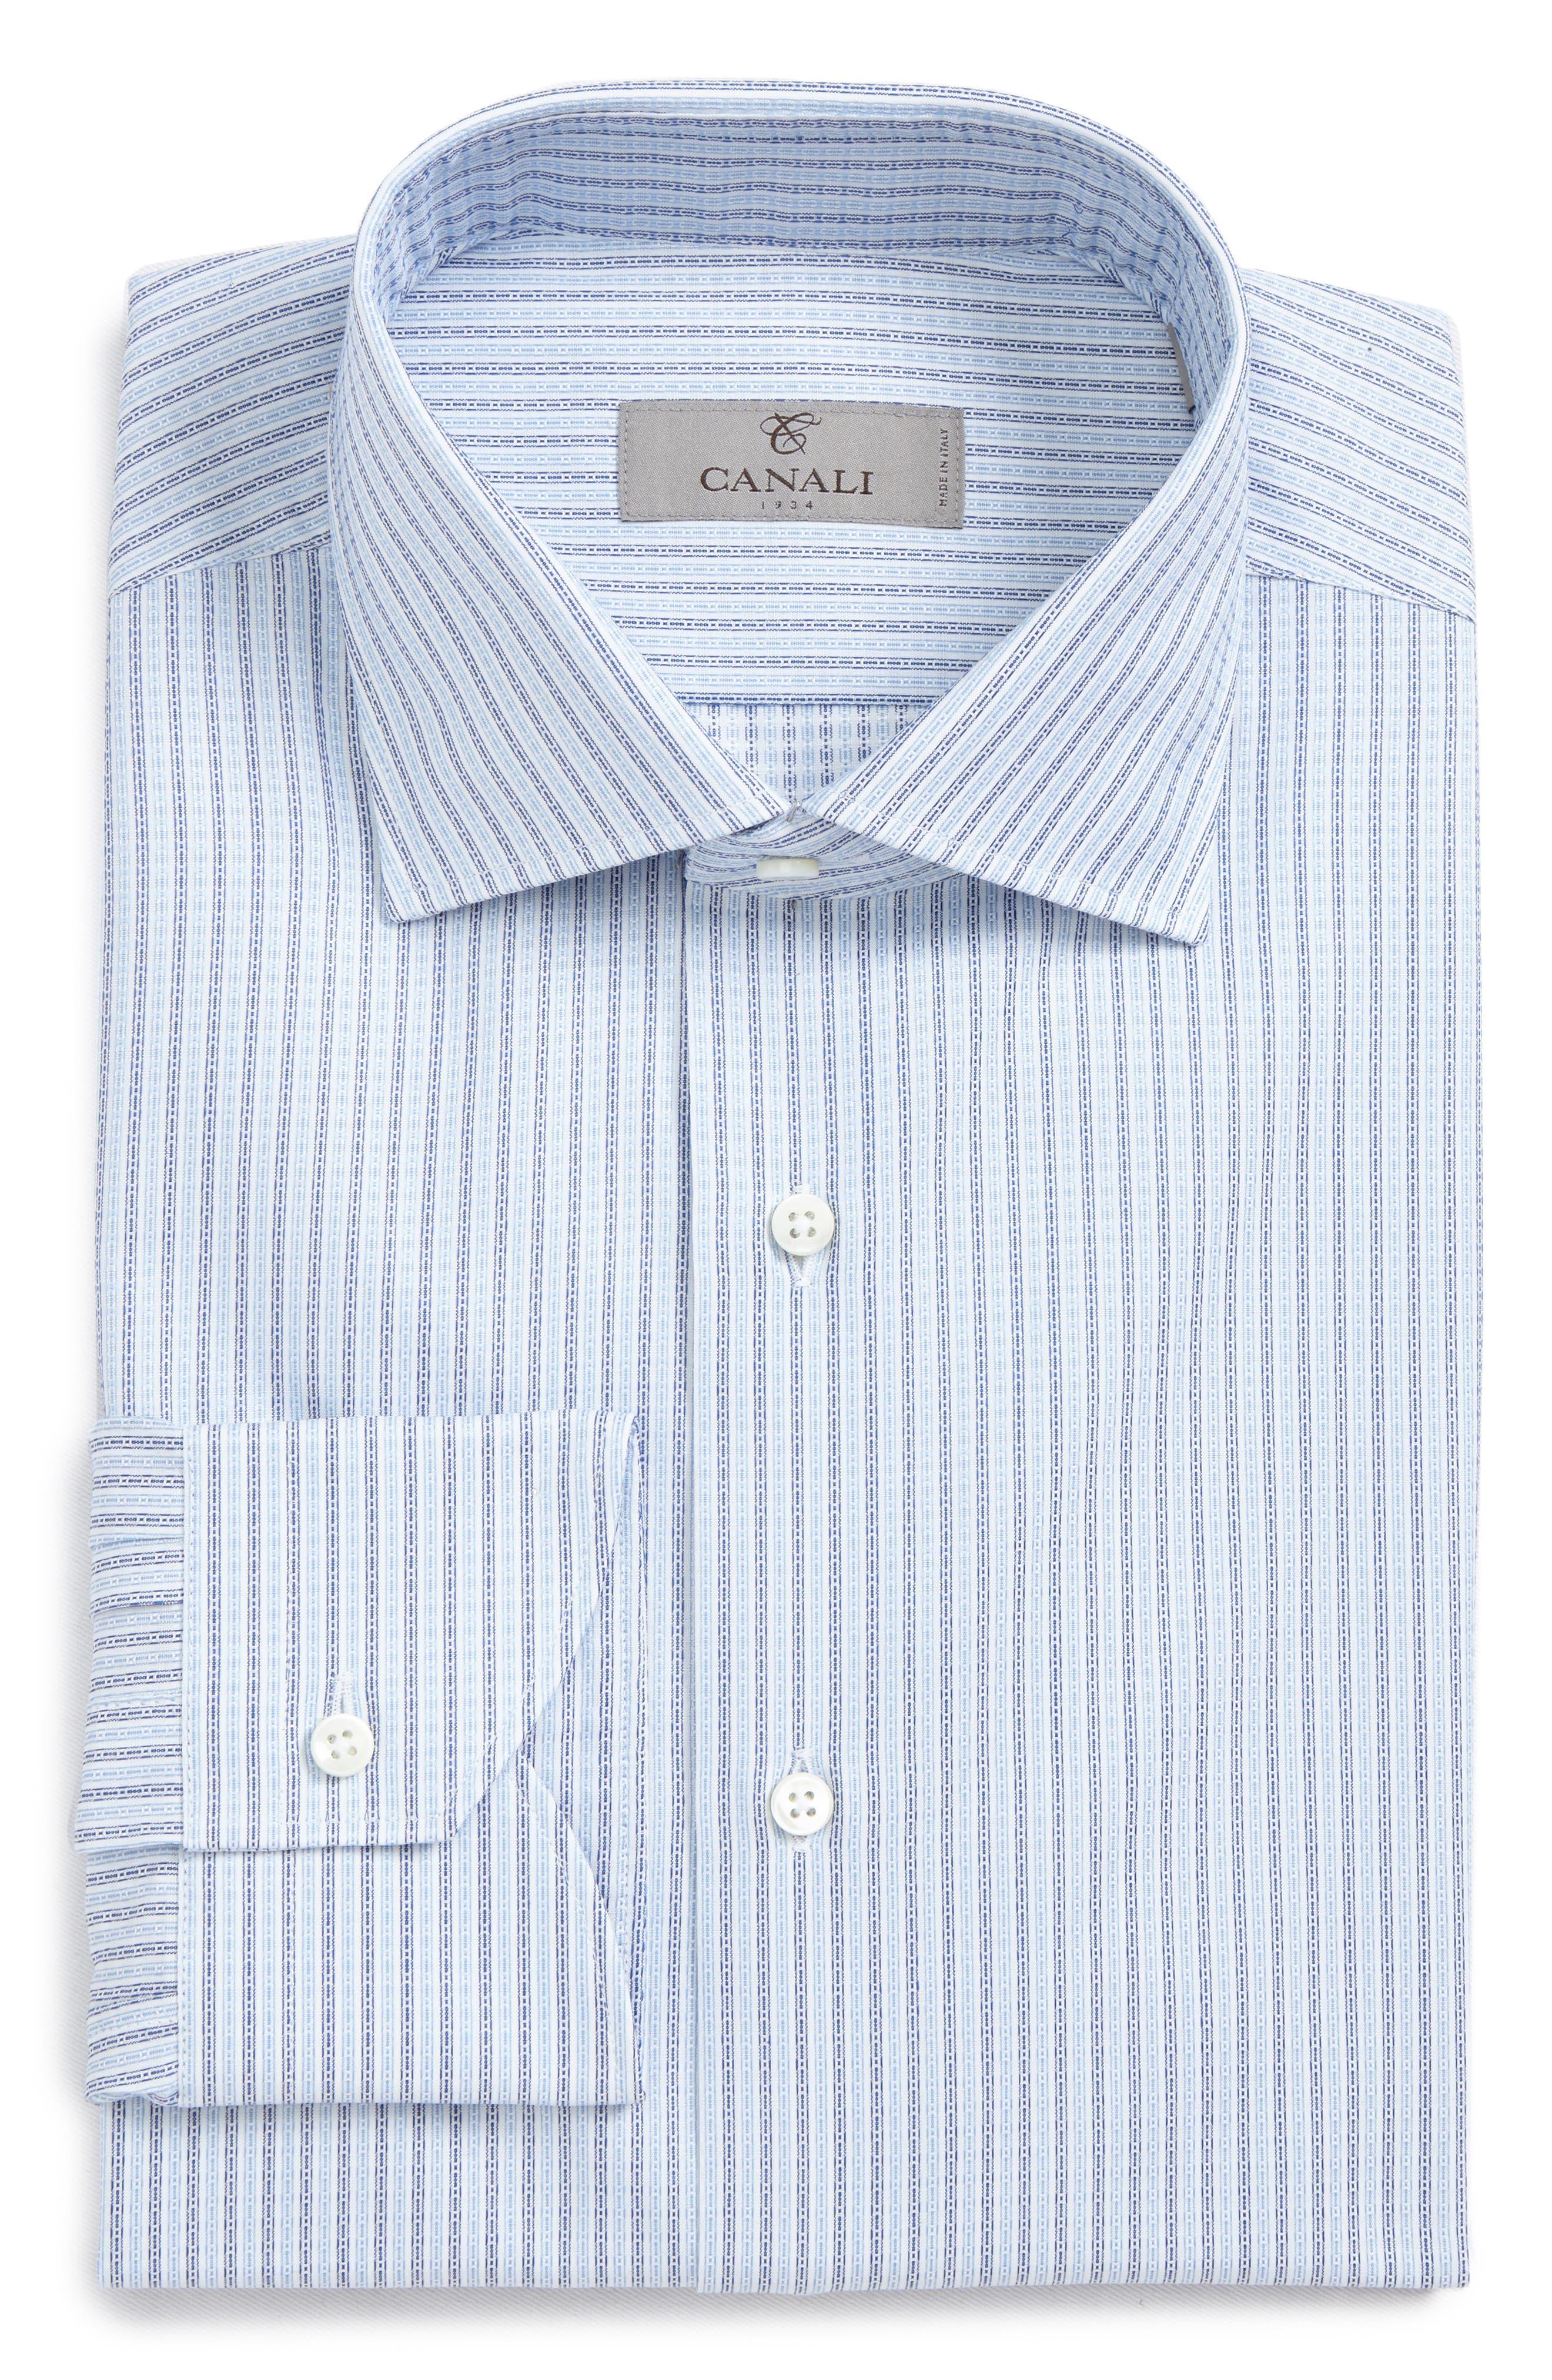 Regular Fit Geometric Dress Shirt,                             Main thumbnail 1, color,                             Med Blue